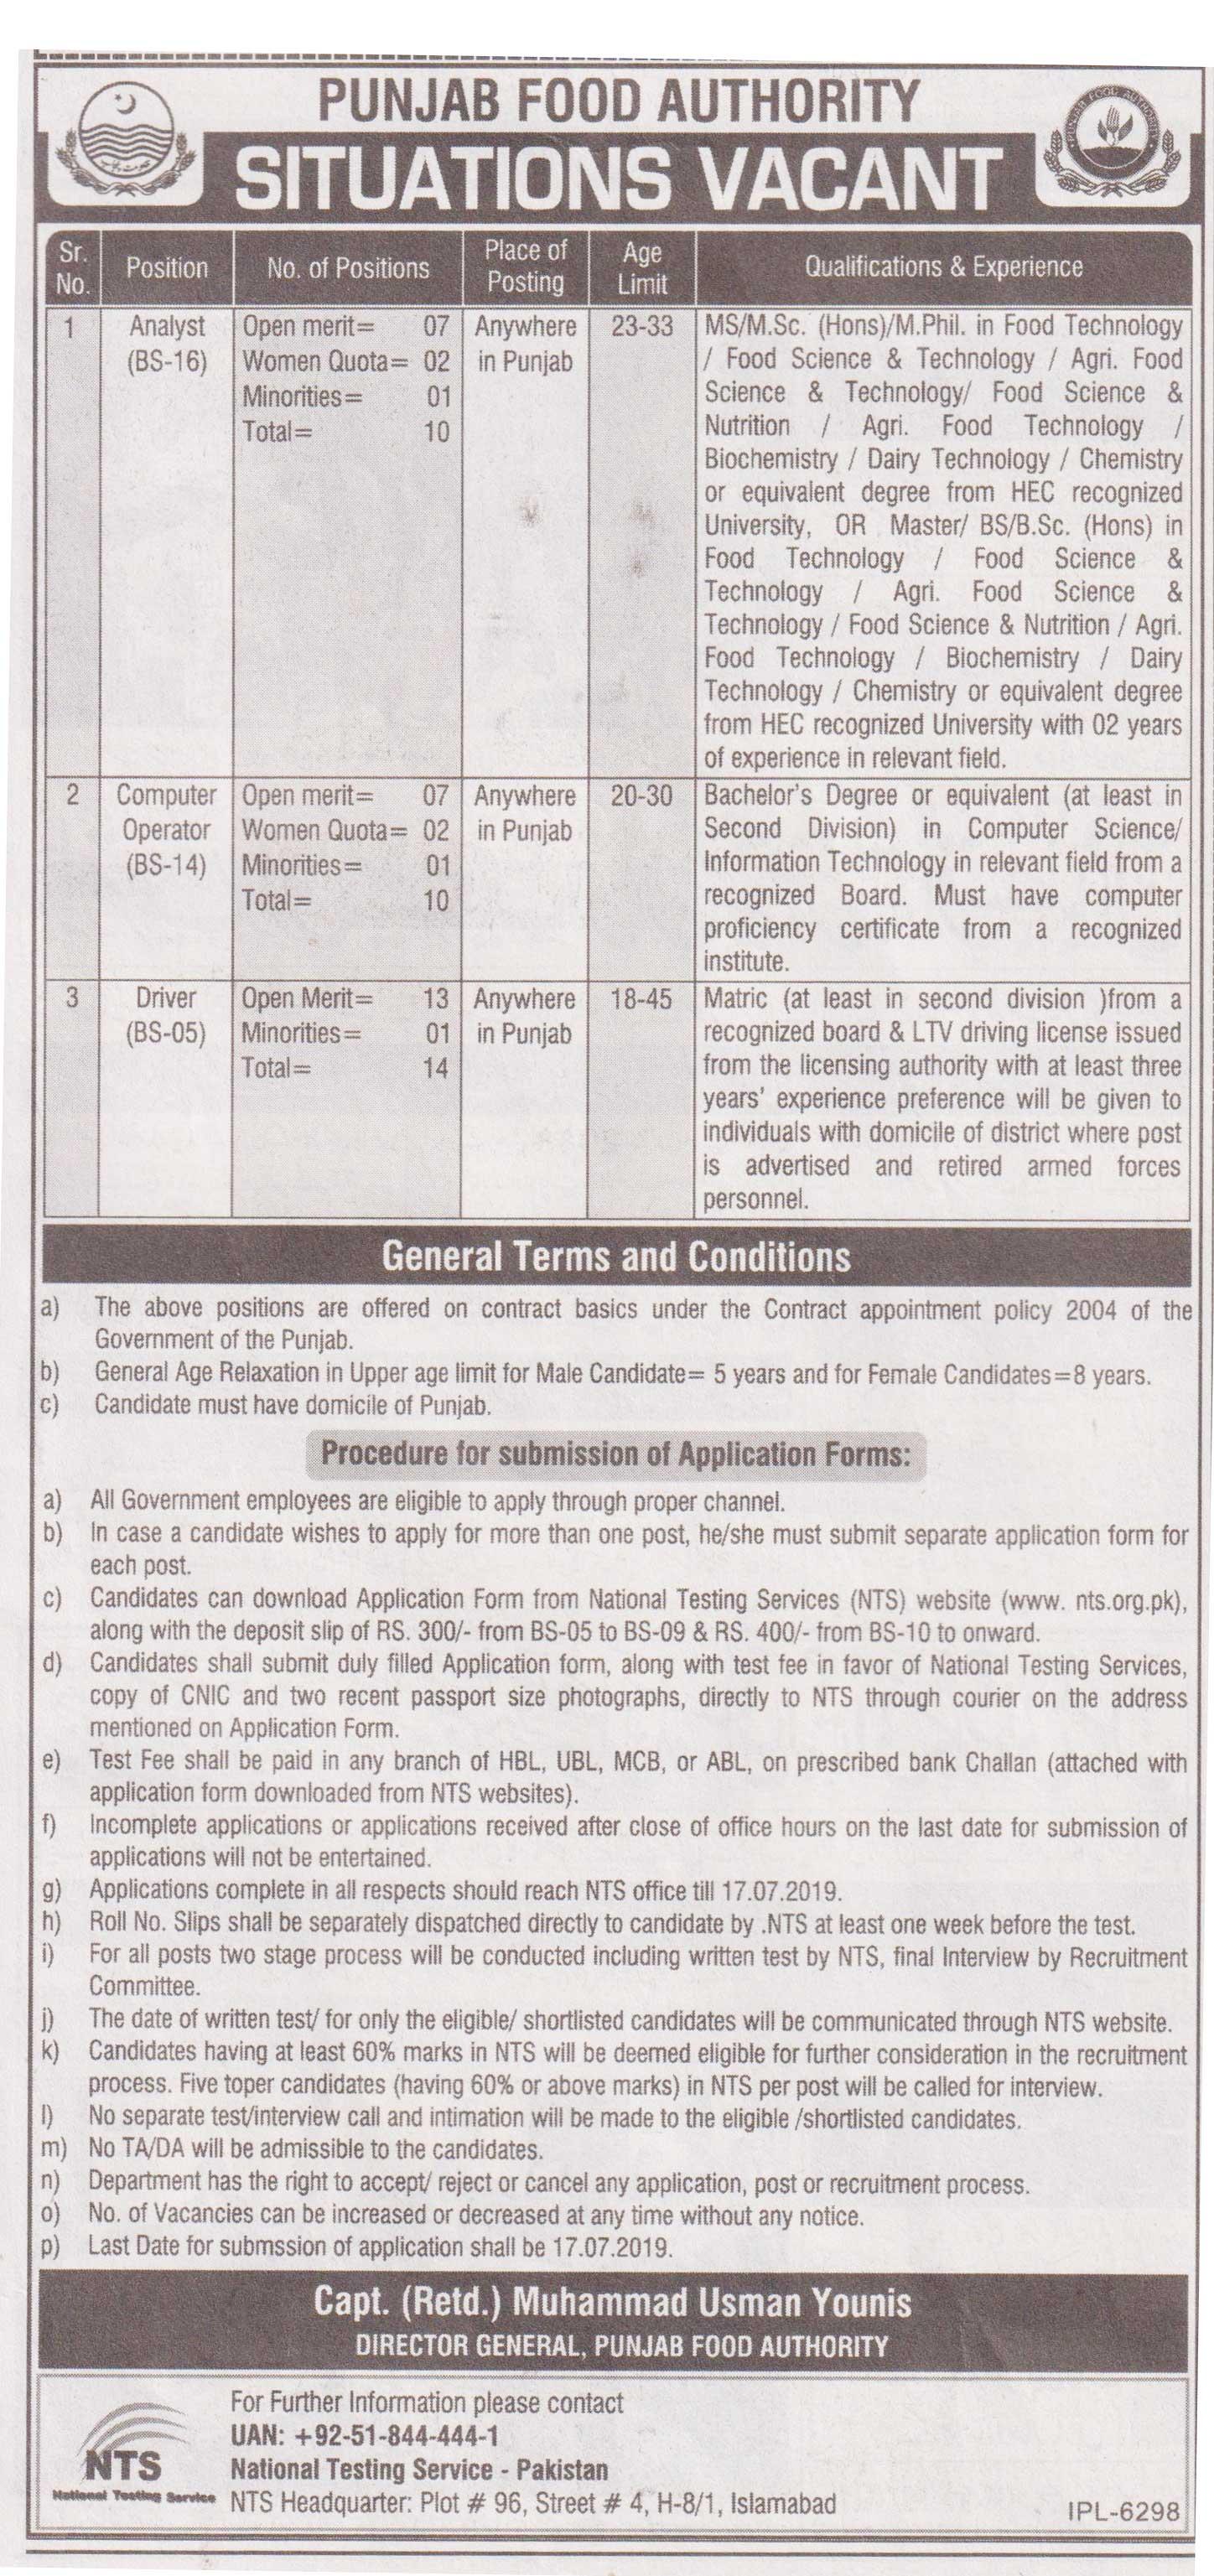 NTS Announced Latest Punjab Food Authority Jobs 24 Jul 2019